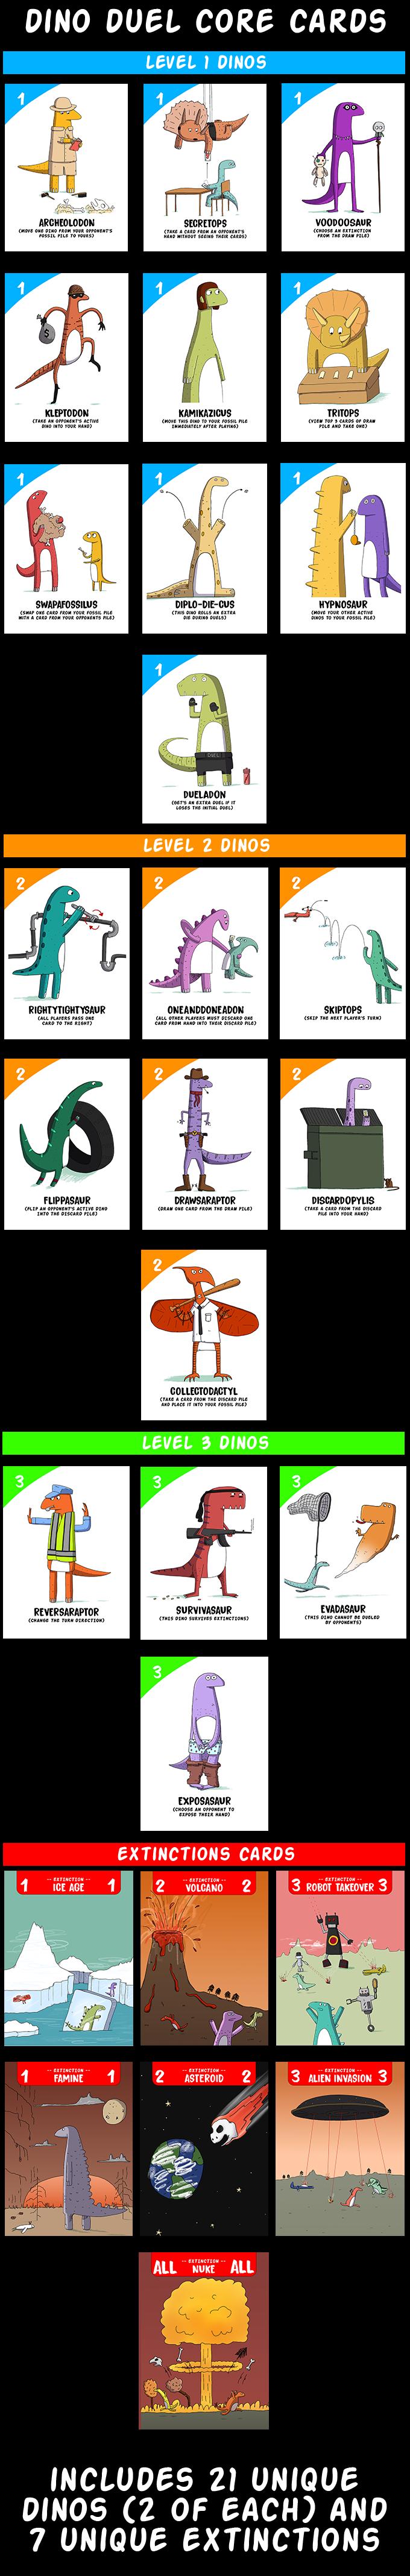 Core cards include 21 unique dinos and 7 unique extinctions.